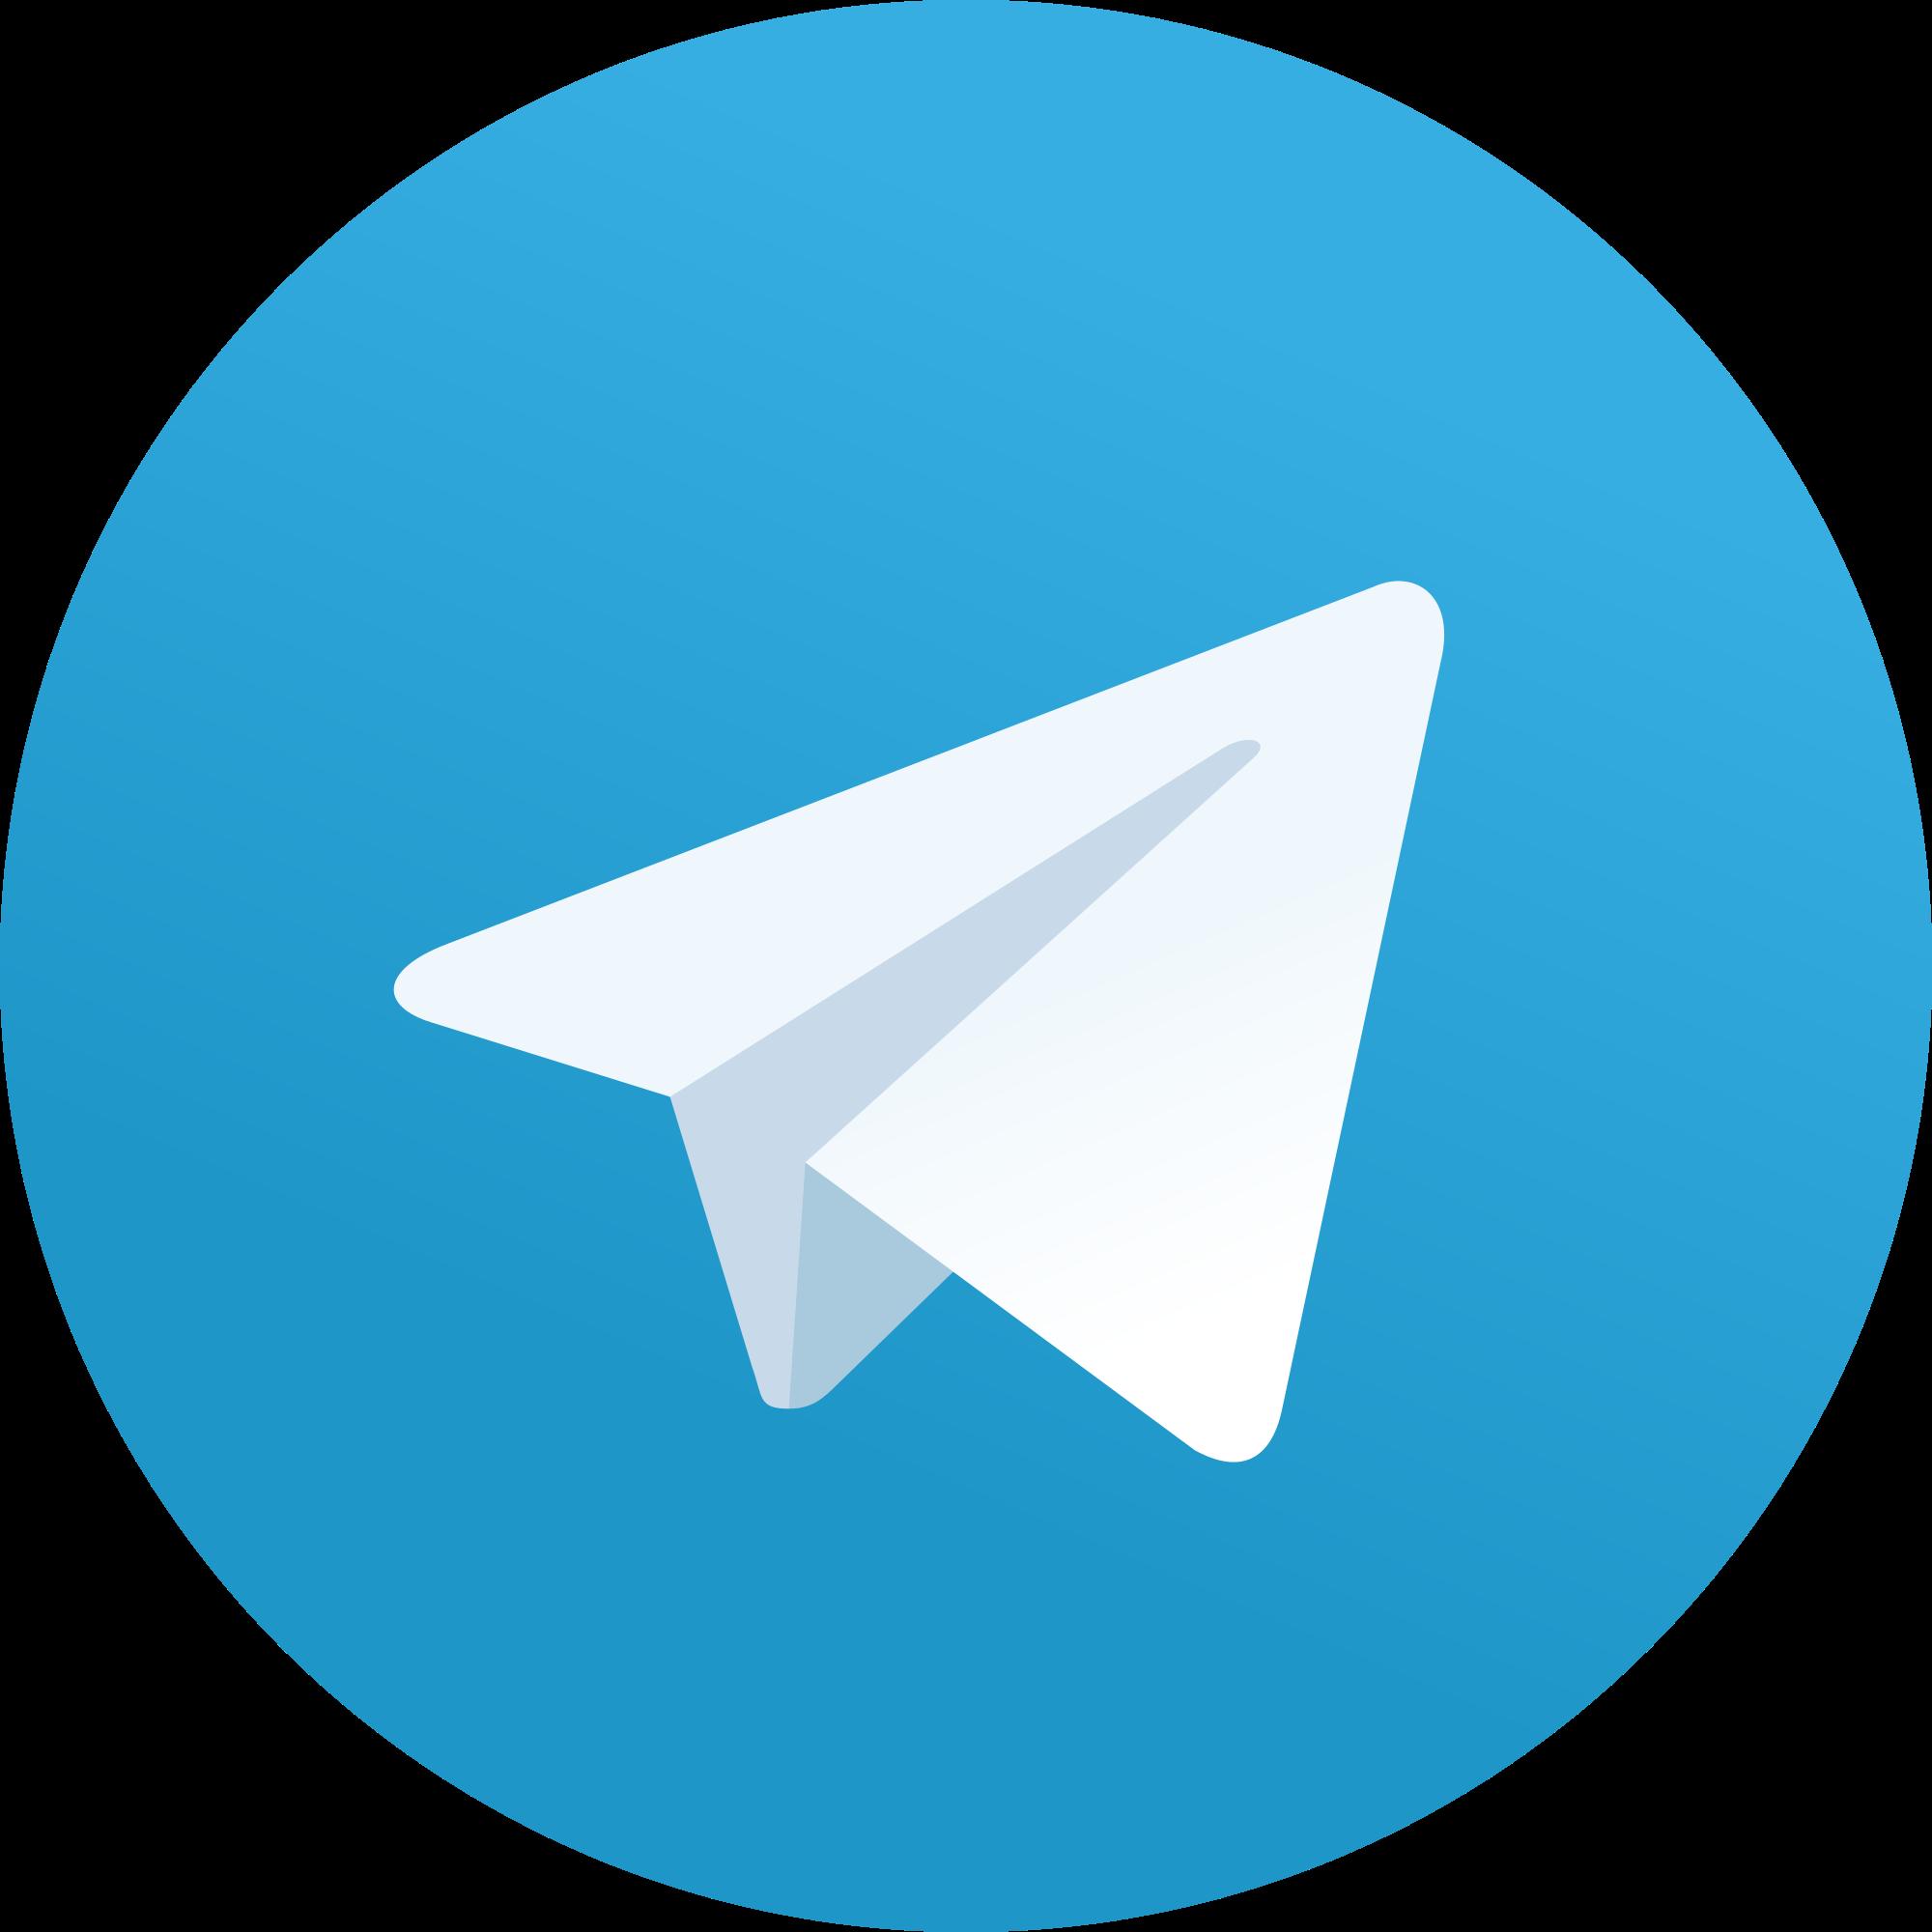 لوگو پیام رسان تلگرام